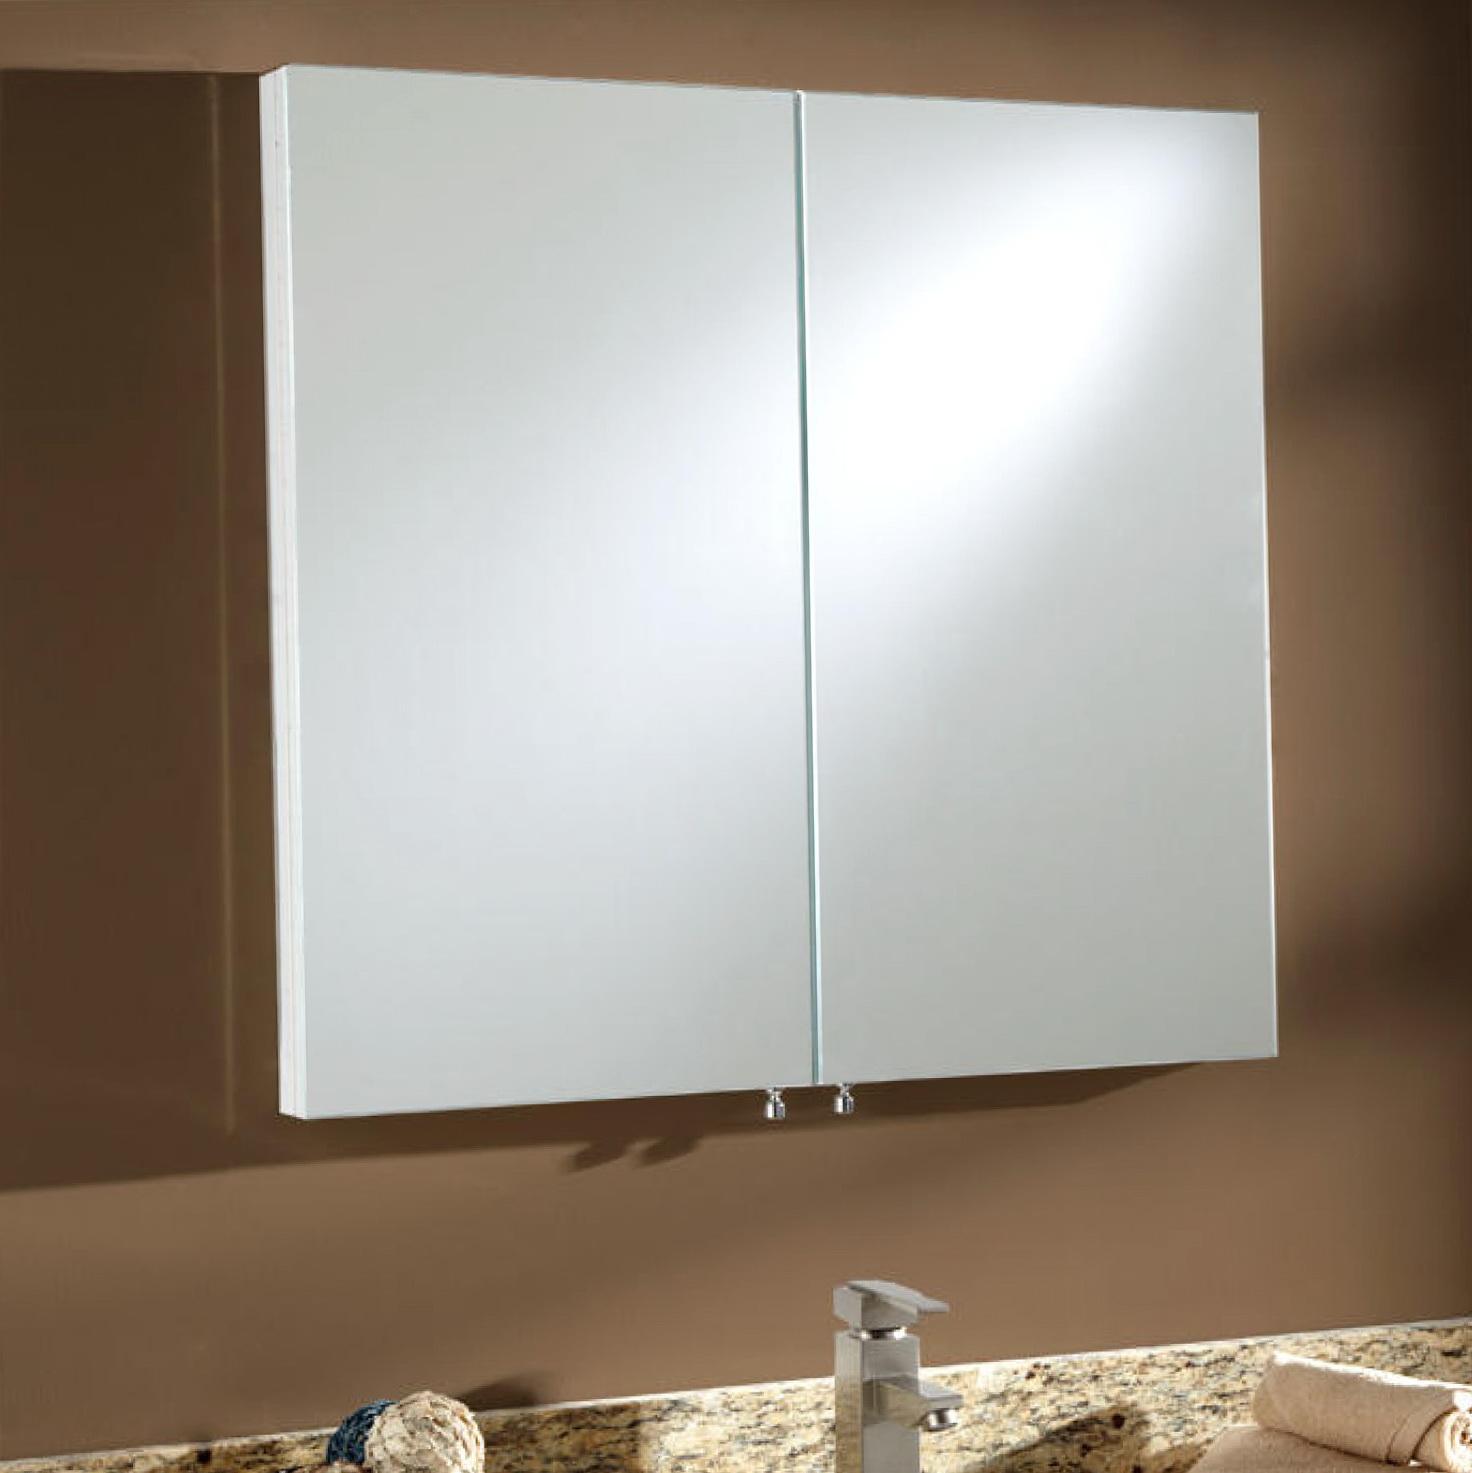 White Recessed Medicine Cabinet With Mirror